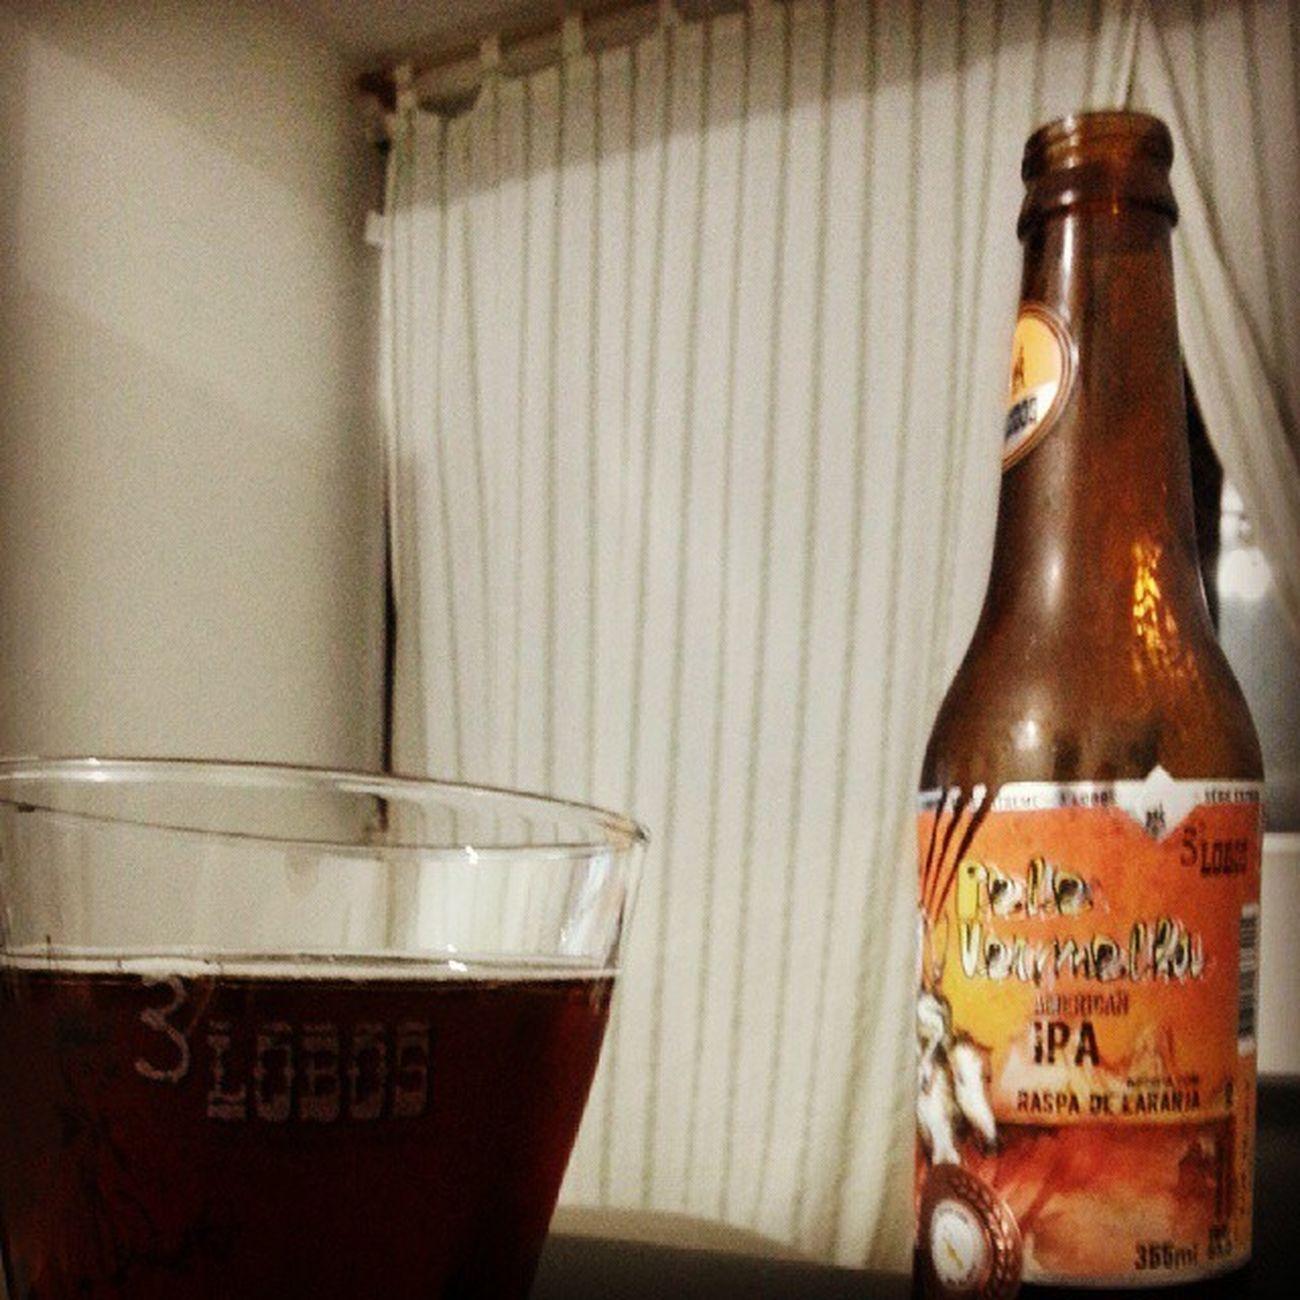 Sábado novo, cerveja nova! ;) 3lobos